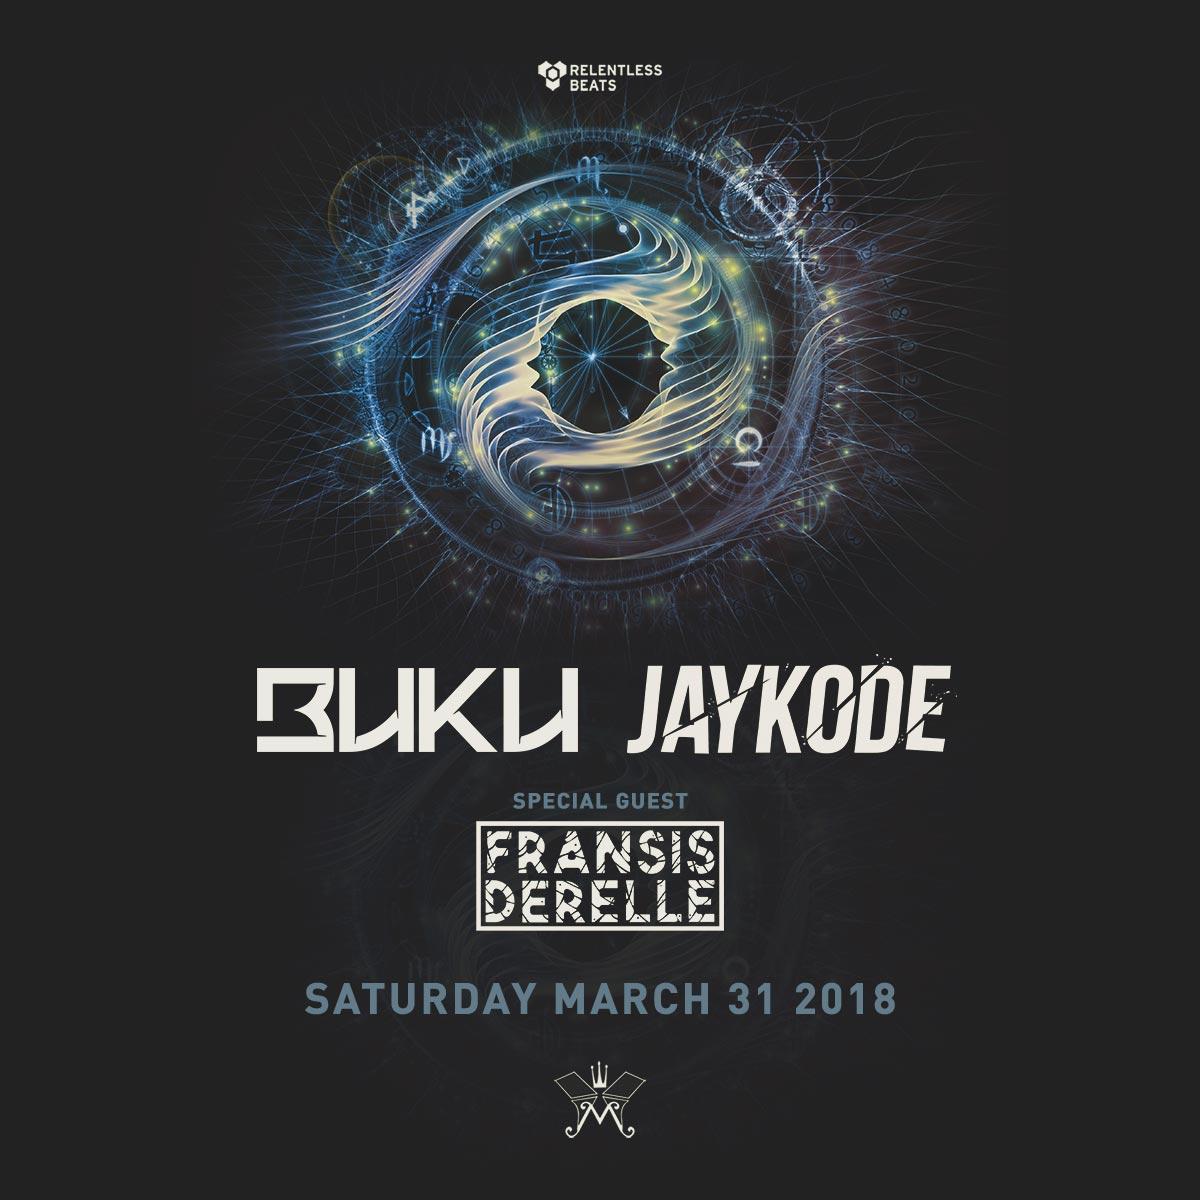 Flyer for Buku + Jaykode